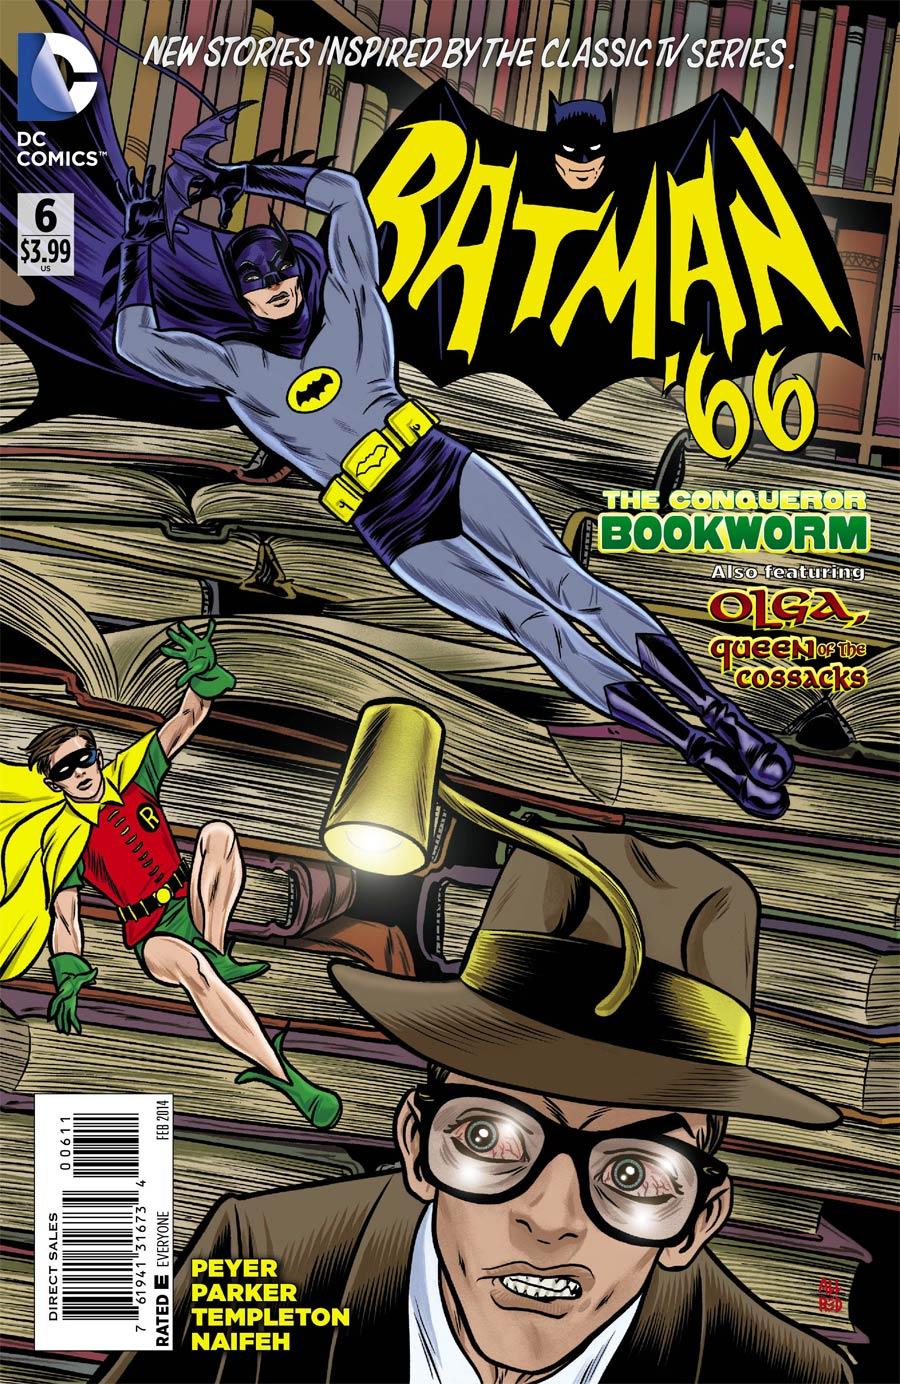 Batman 66 #6 Cover A Regular Mike Allred Cover